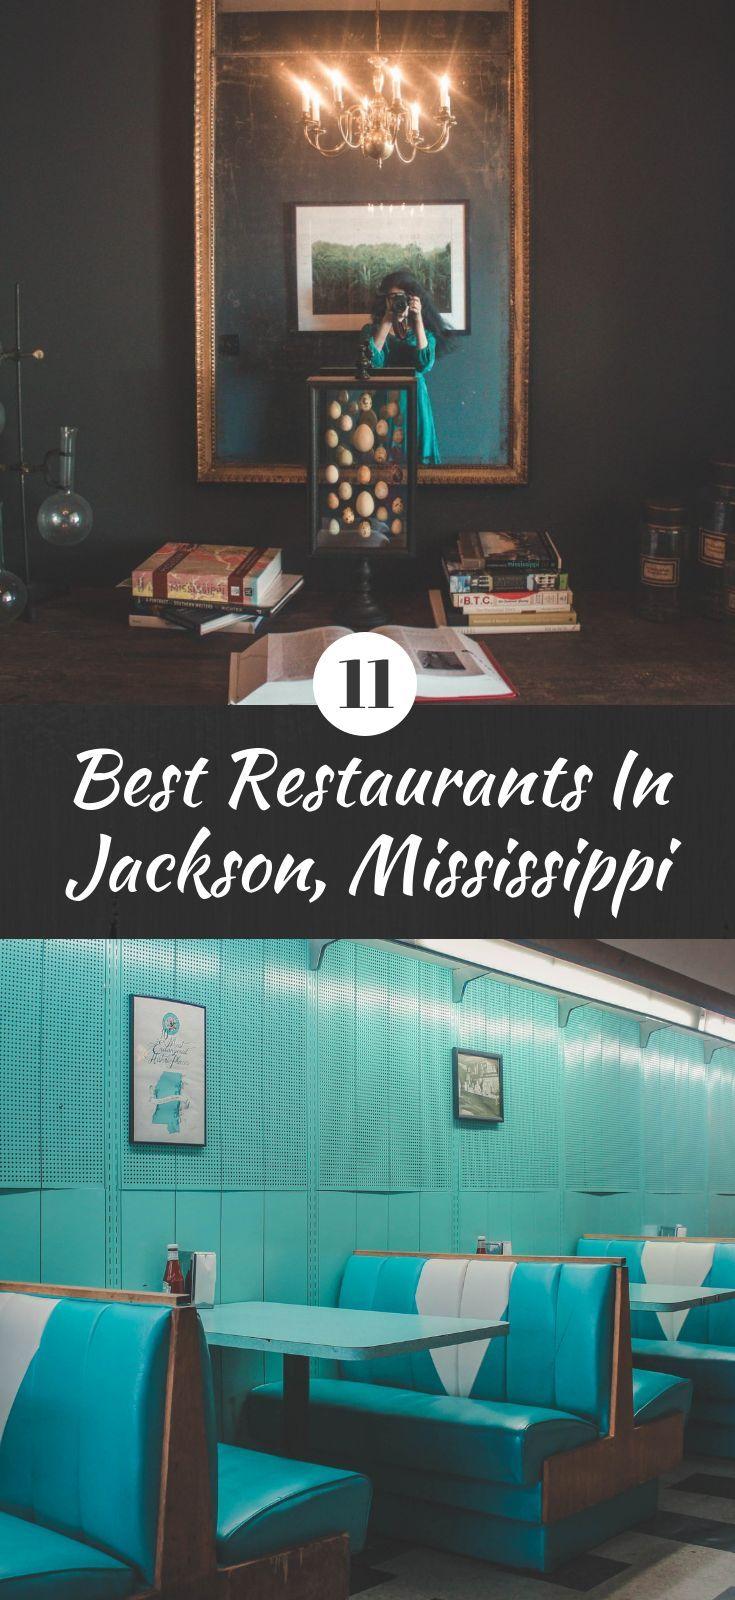 Best restaurants in jackson mississippi jackson